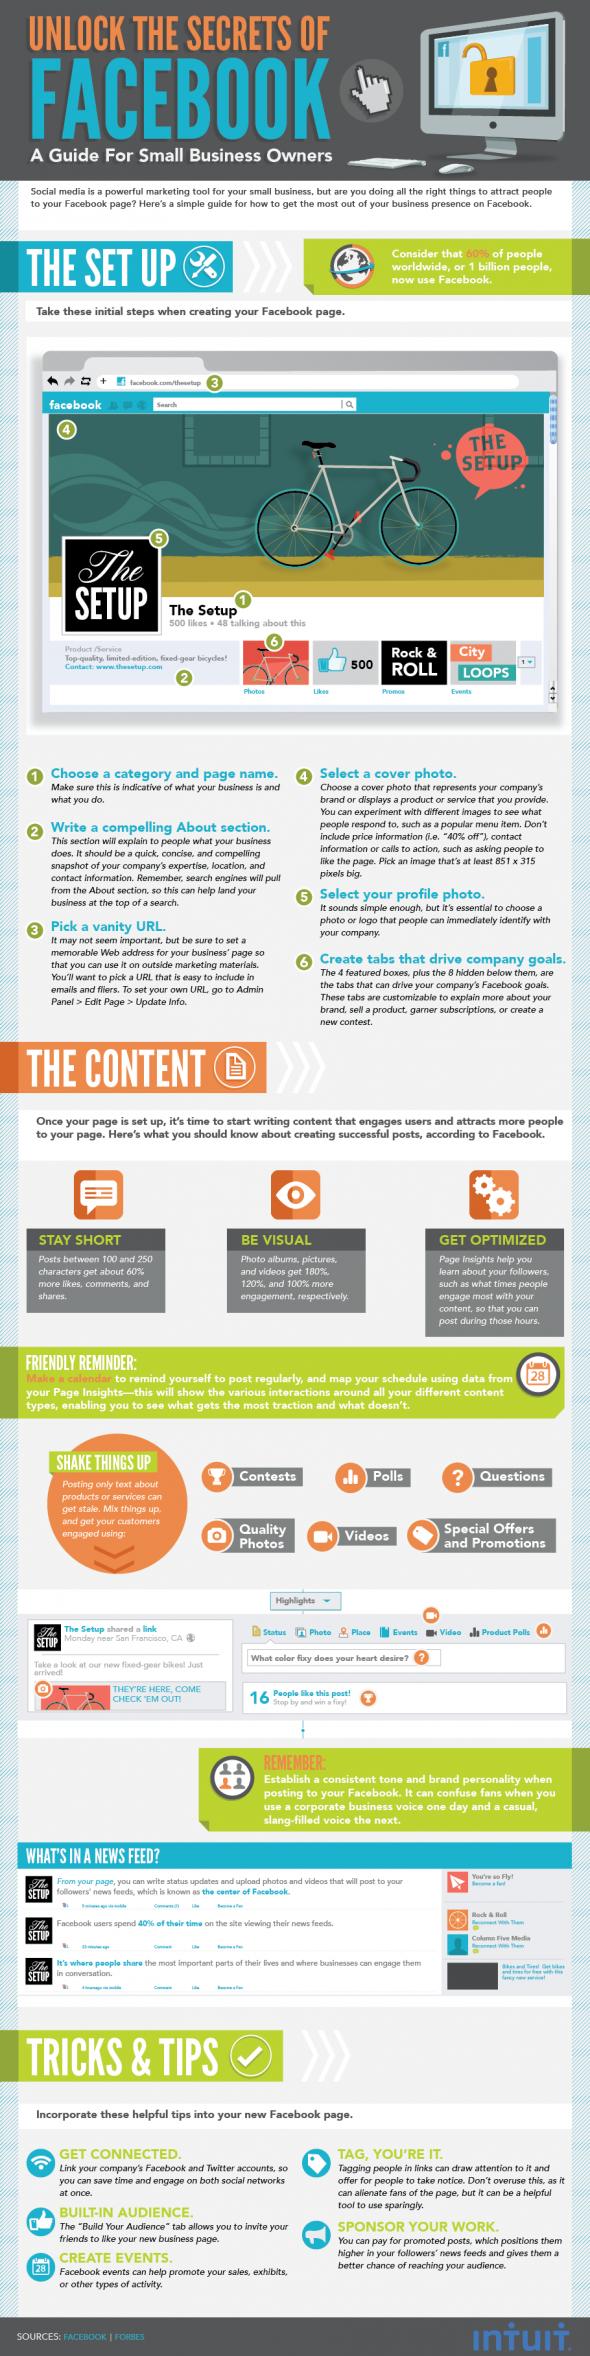 Unlock The Secrets Of #Facebook - A Guide For #SmallBusinesses - #infographic #socialmediamarketing